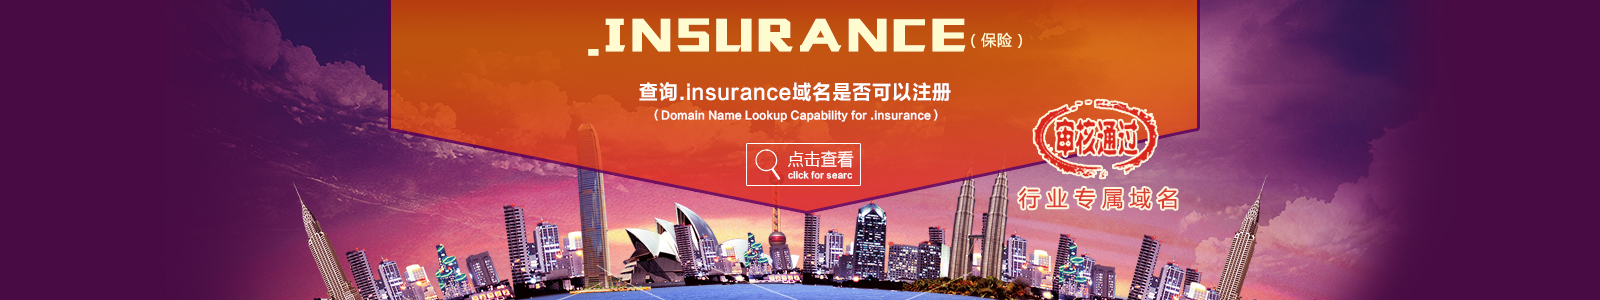 .insurance